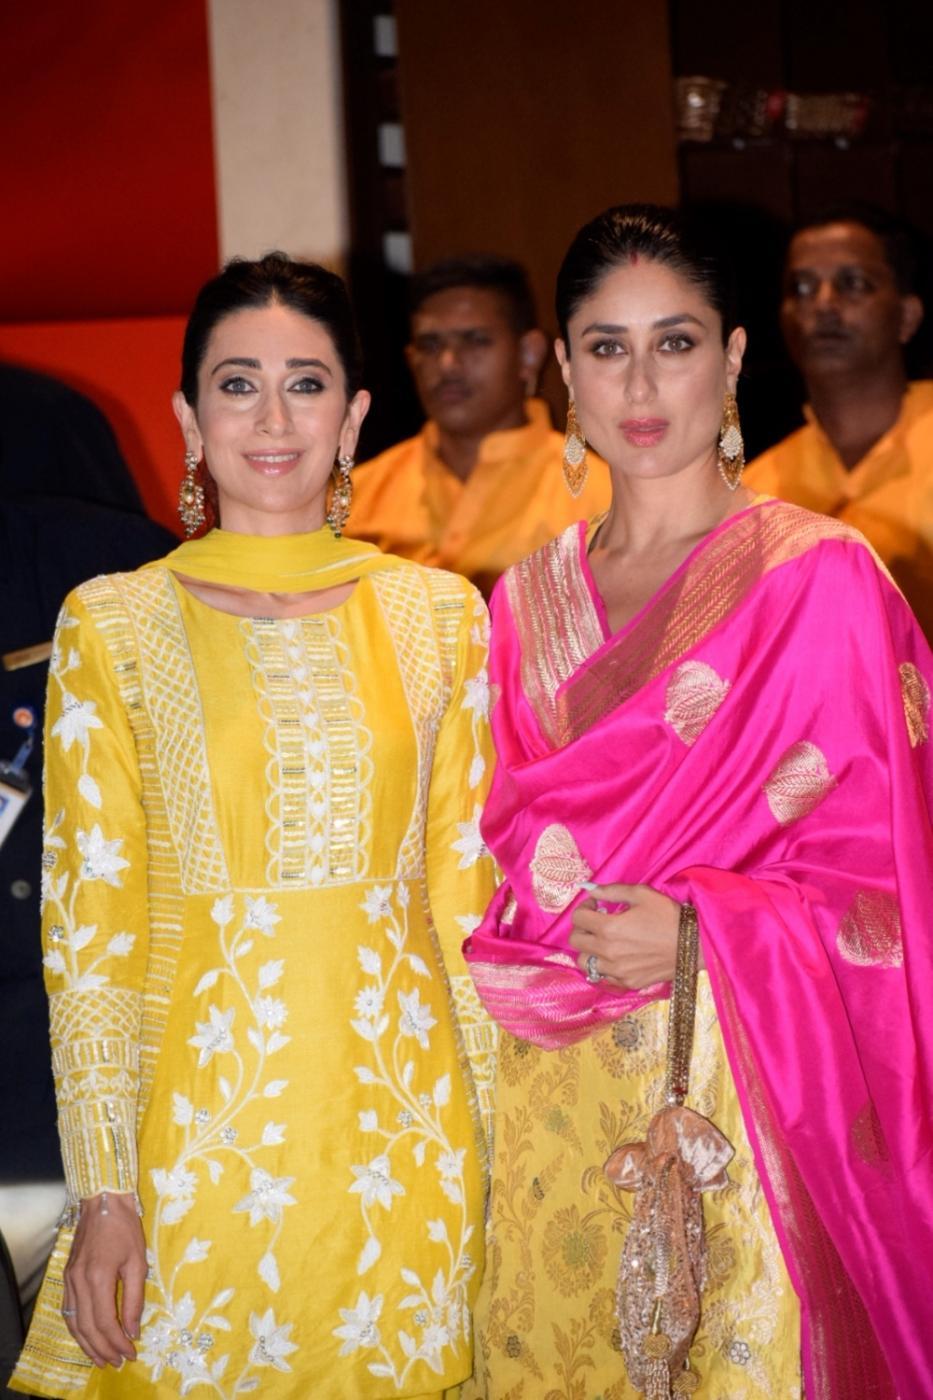 Mumbai: Actresses Karisma Kapoor and Kareena Kapoor Khan arrive at Reliance Industries Chairman and MD Mukesh Ambani's residence to celebrate Ganesh Chaturthi in Mumbai on Sept 13, 2018. (Photo: IANS) by .